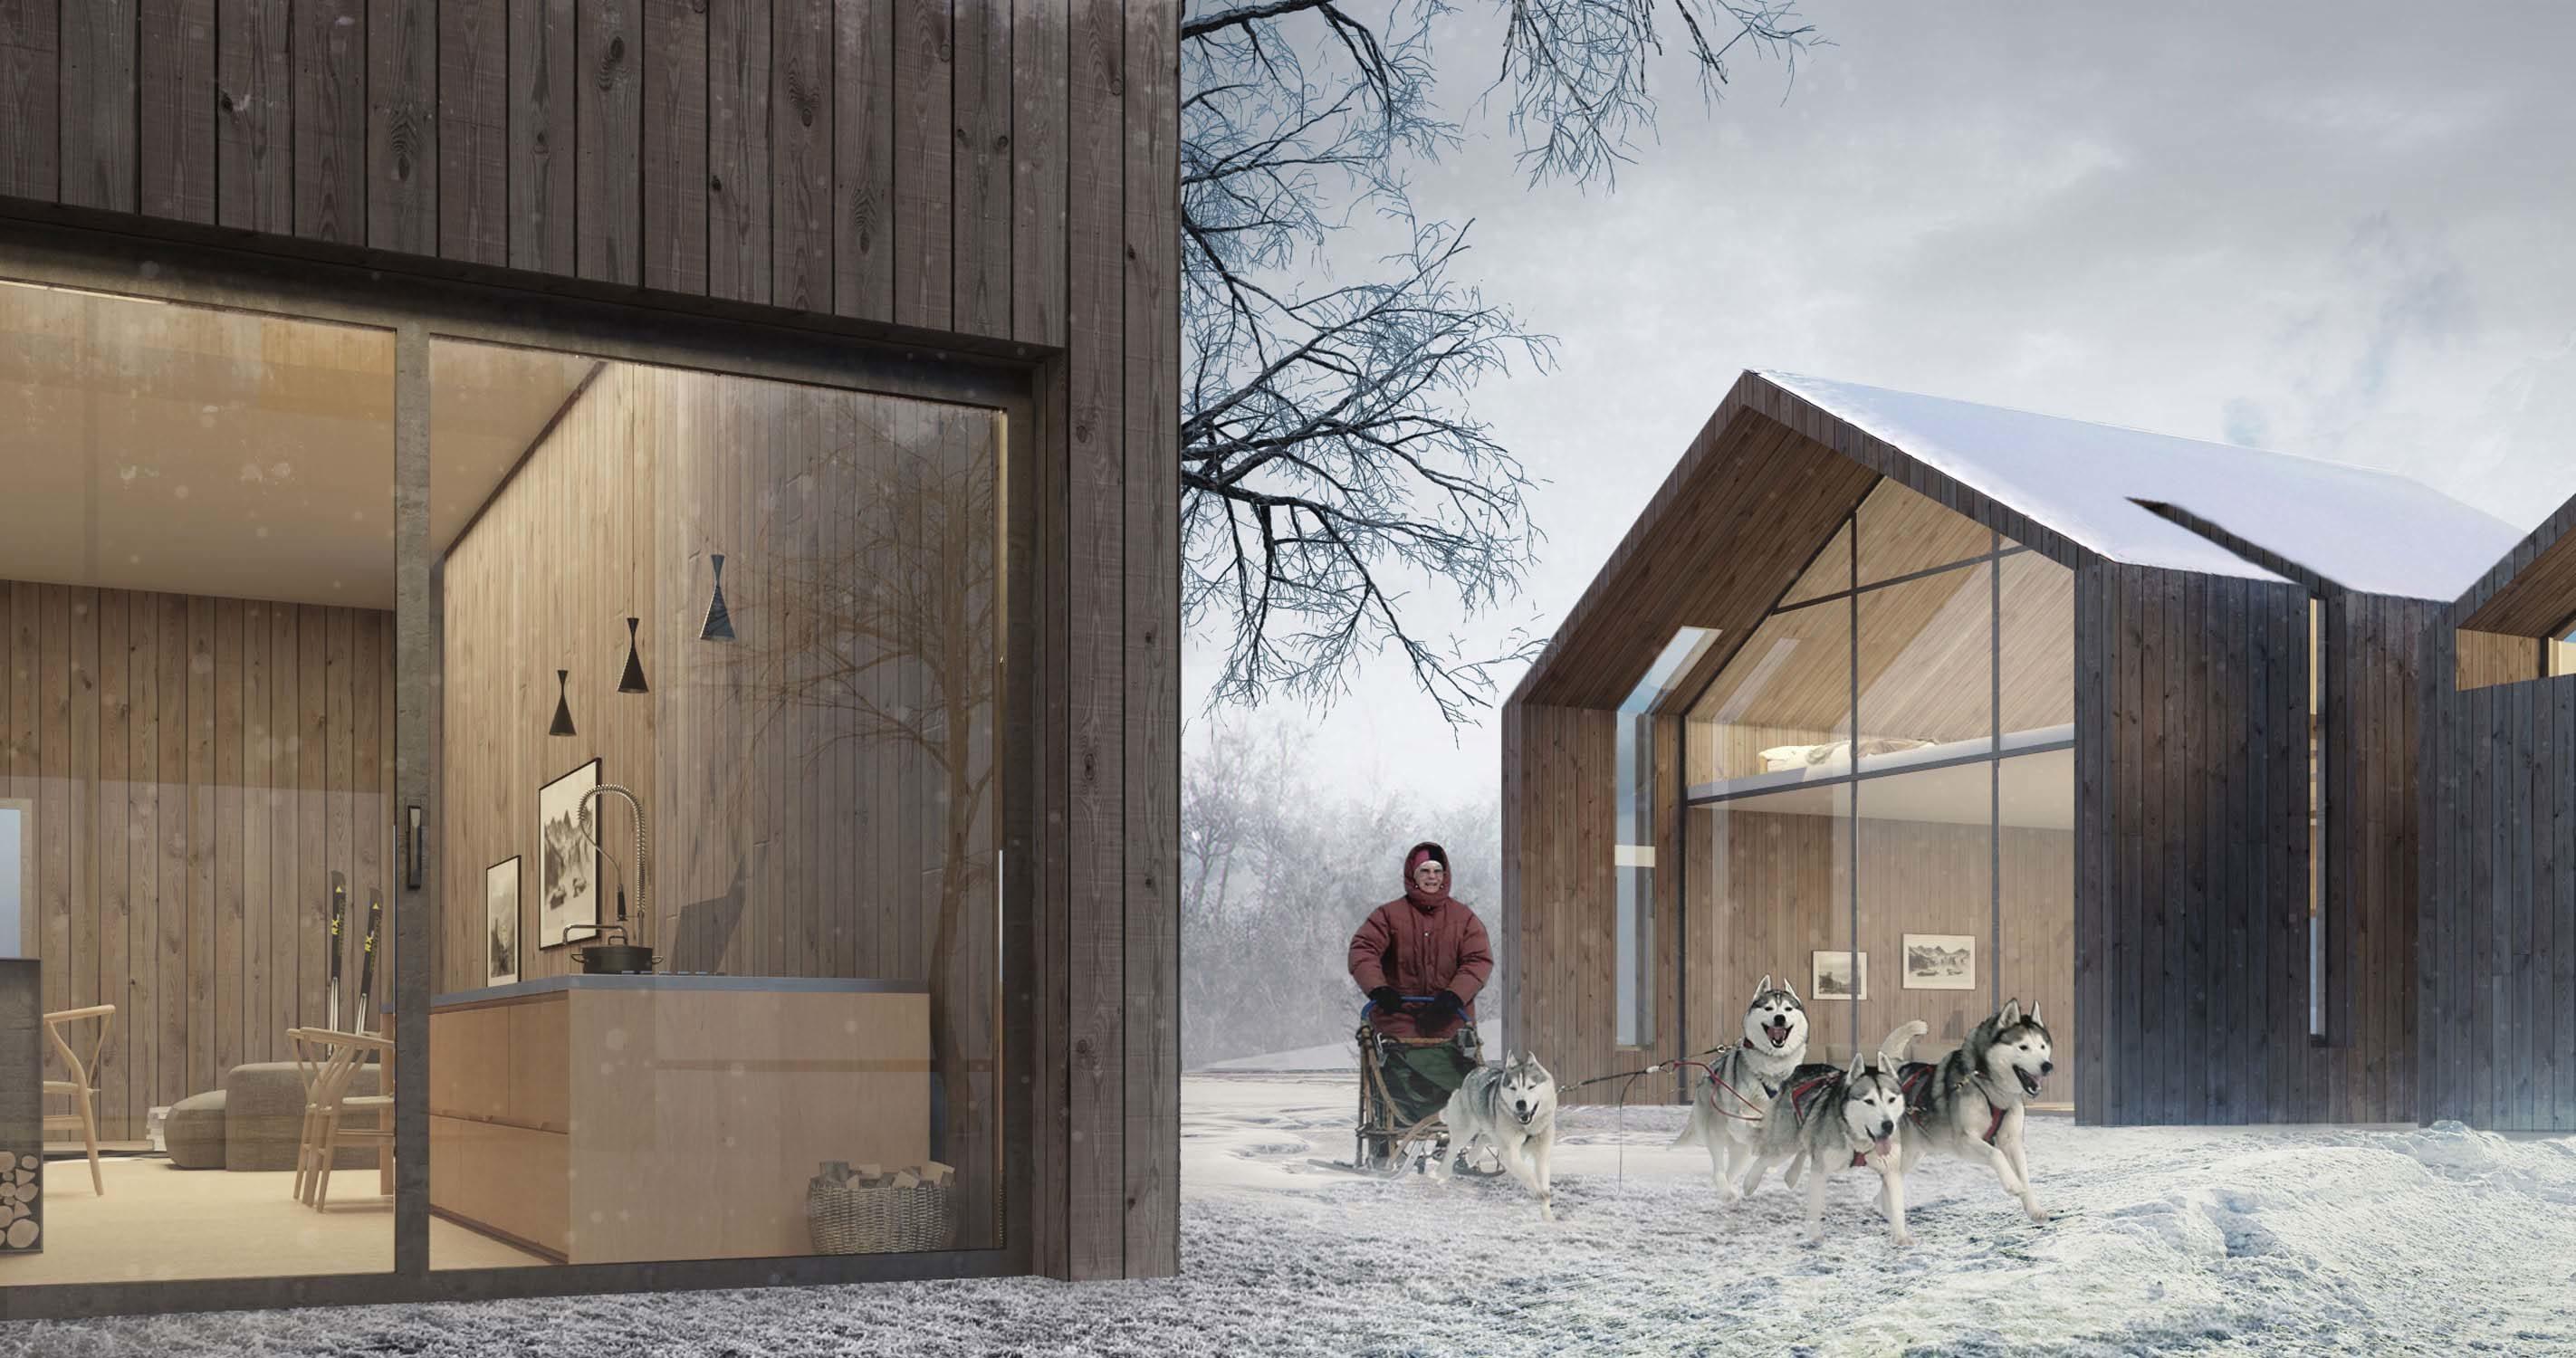 Norwegian cottage in Narvik – Level Creative studio, 2013